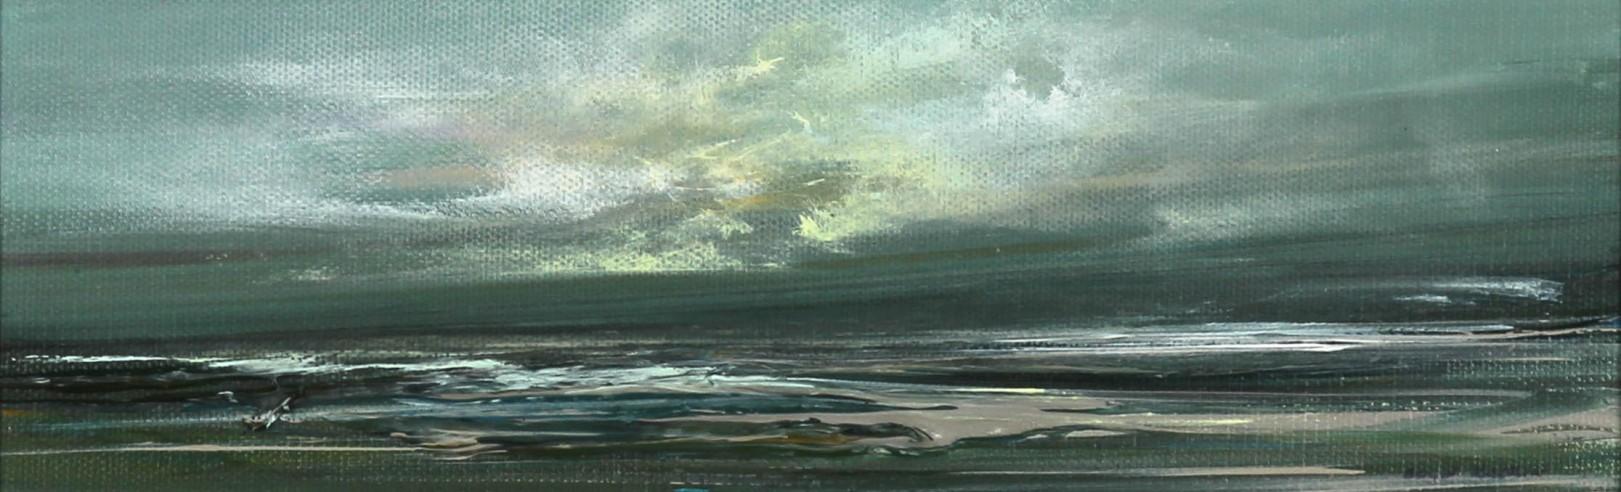 Philip Raskin_Original Acrylic_Toward Tiree_4x12_